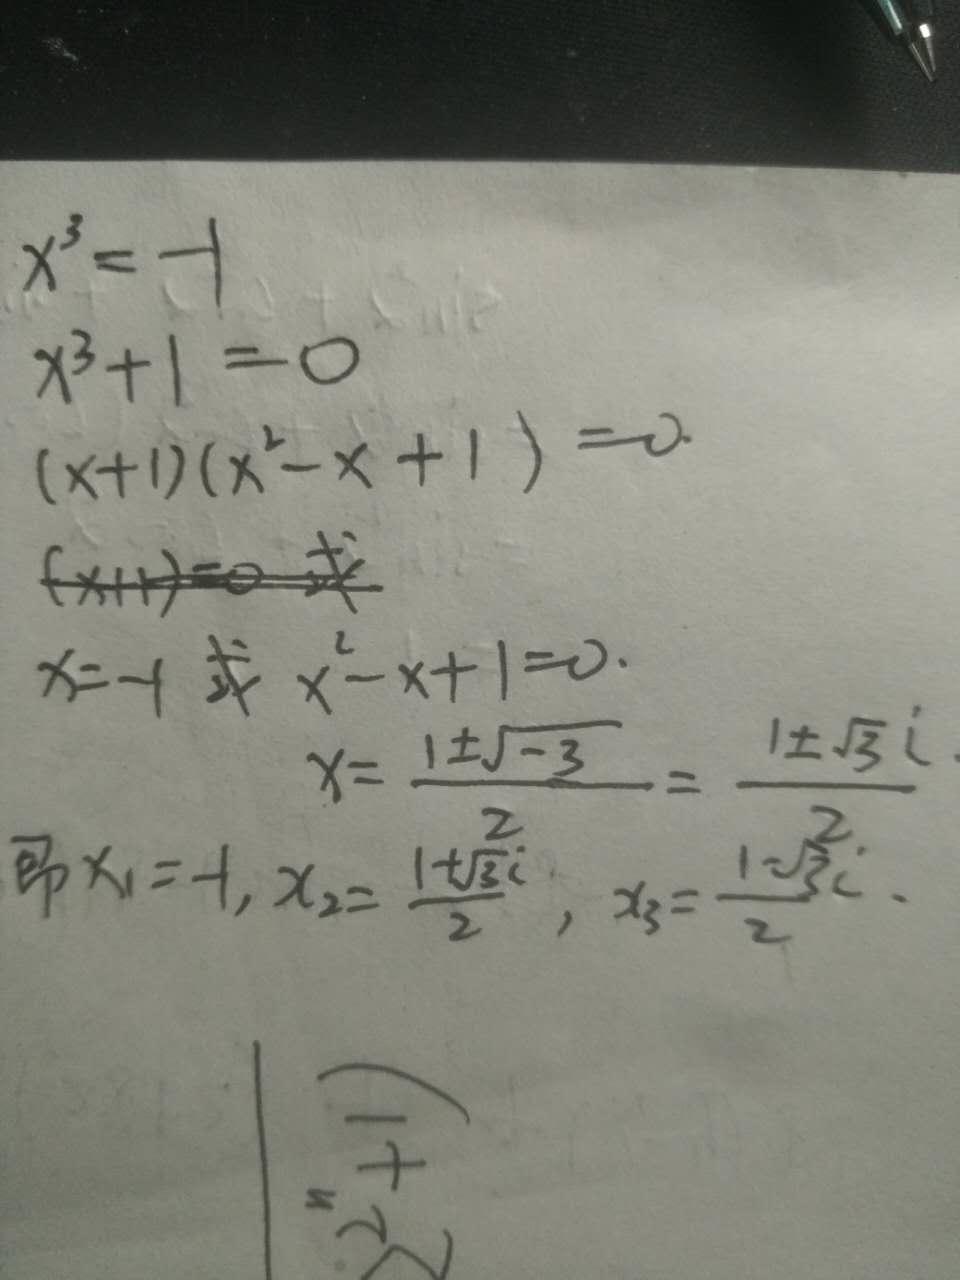 x的立方等于